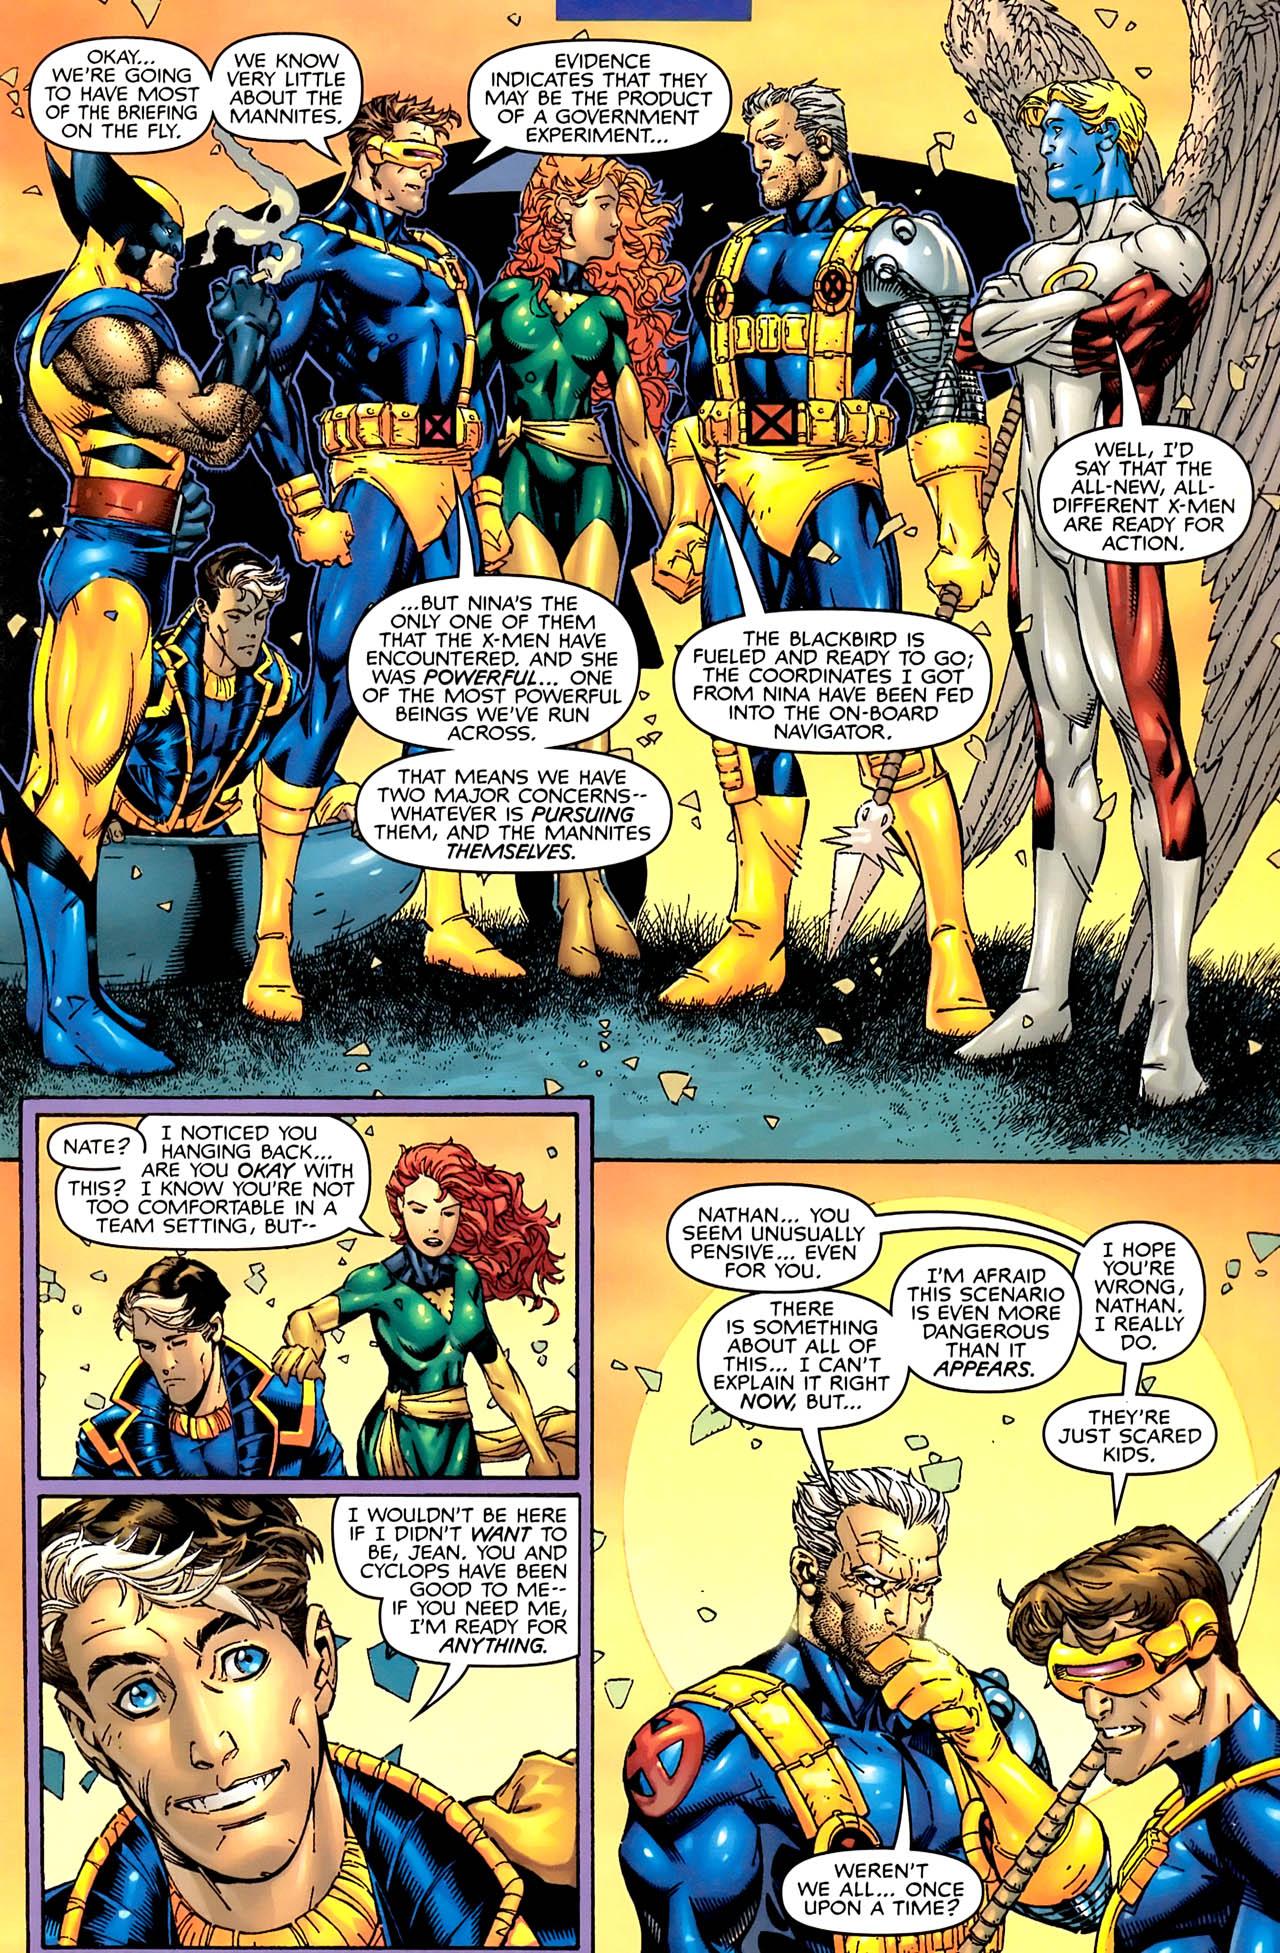 Read online Astonishing X-Men (1999) comic -  Issue #1 - 8